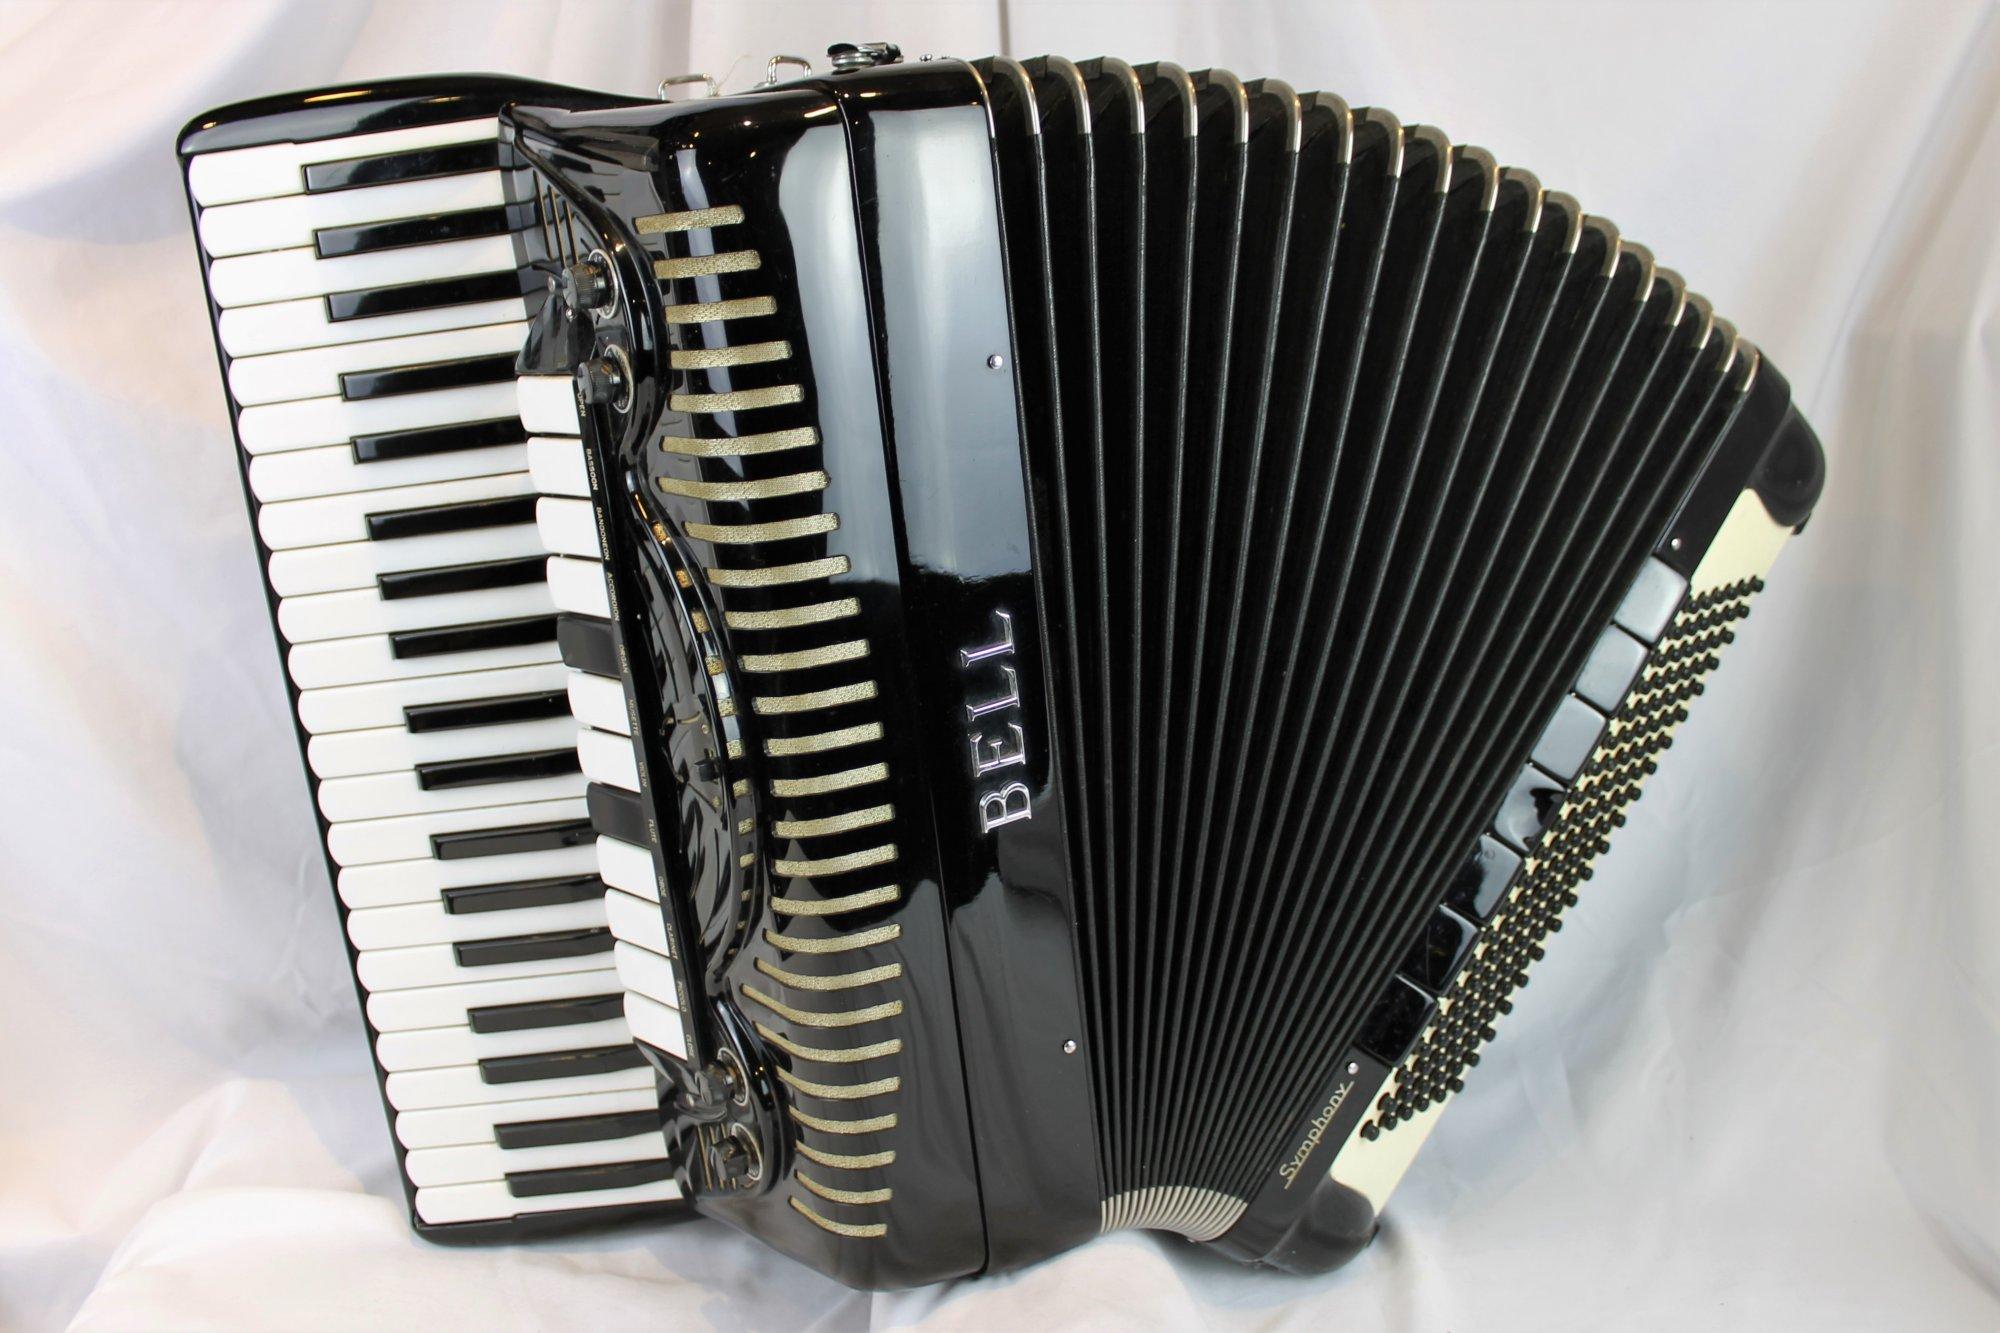 4096 - Black Bell Symphony Piano Accordion LMMH 41 120